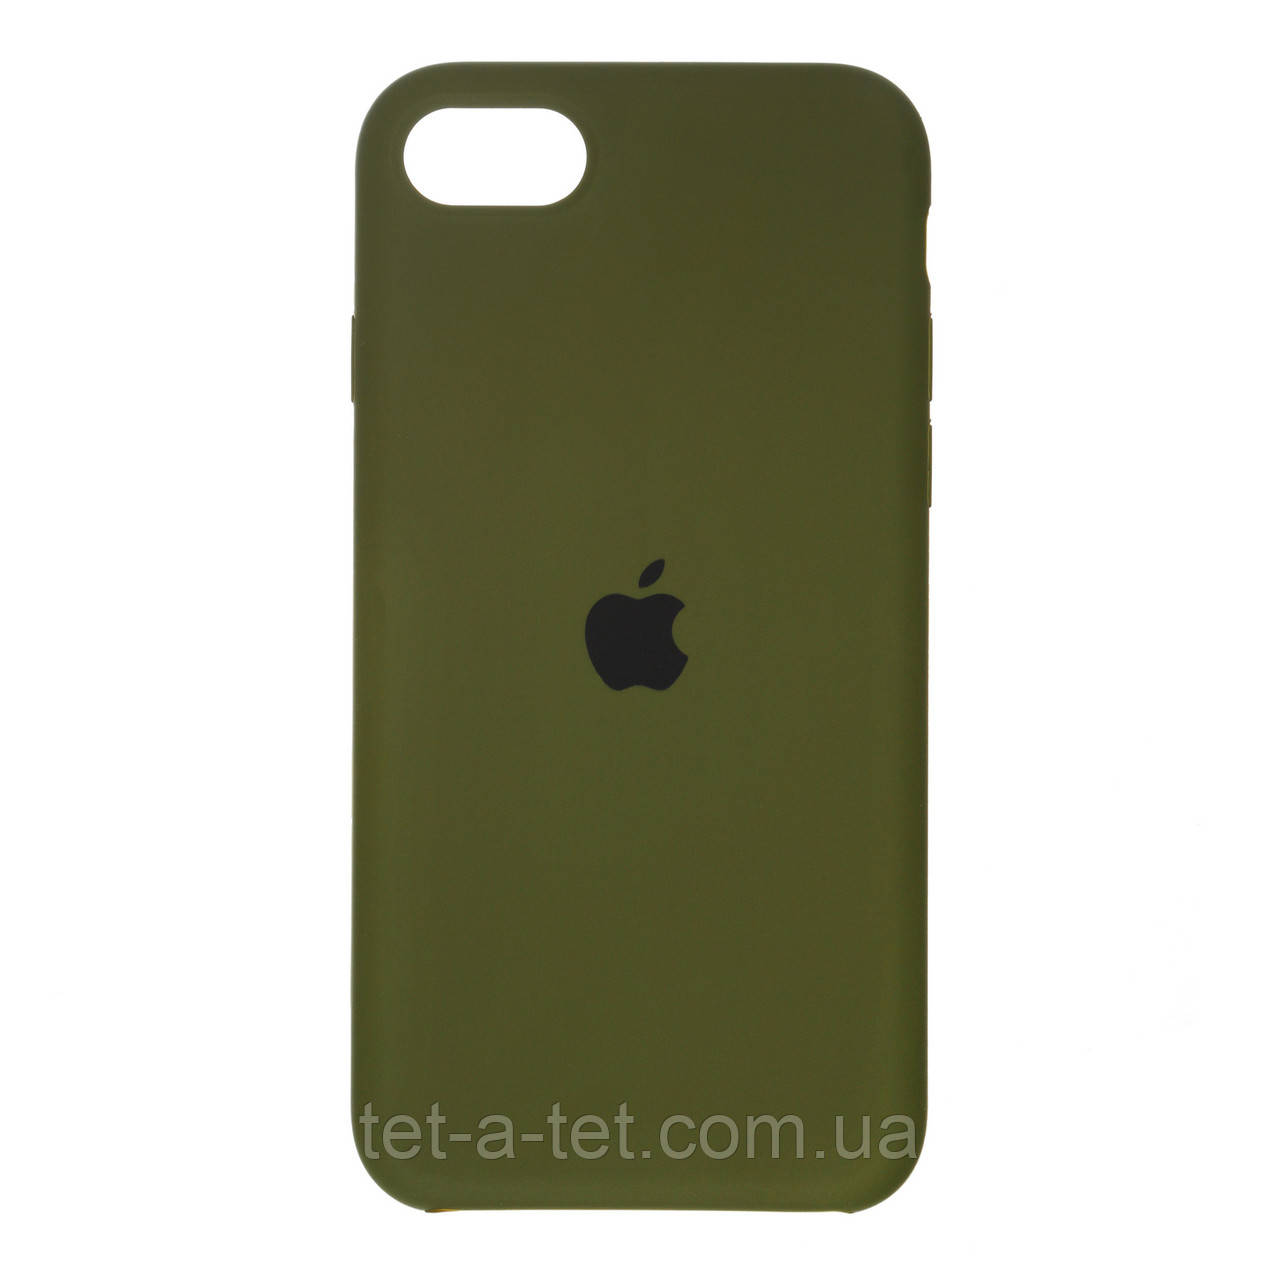 Чехол Silicone Case Original for Apple iPhone 7/8/SE 2020 (HC) - Virid Green